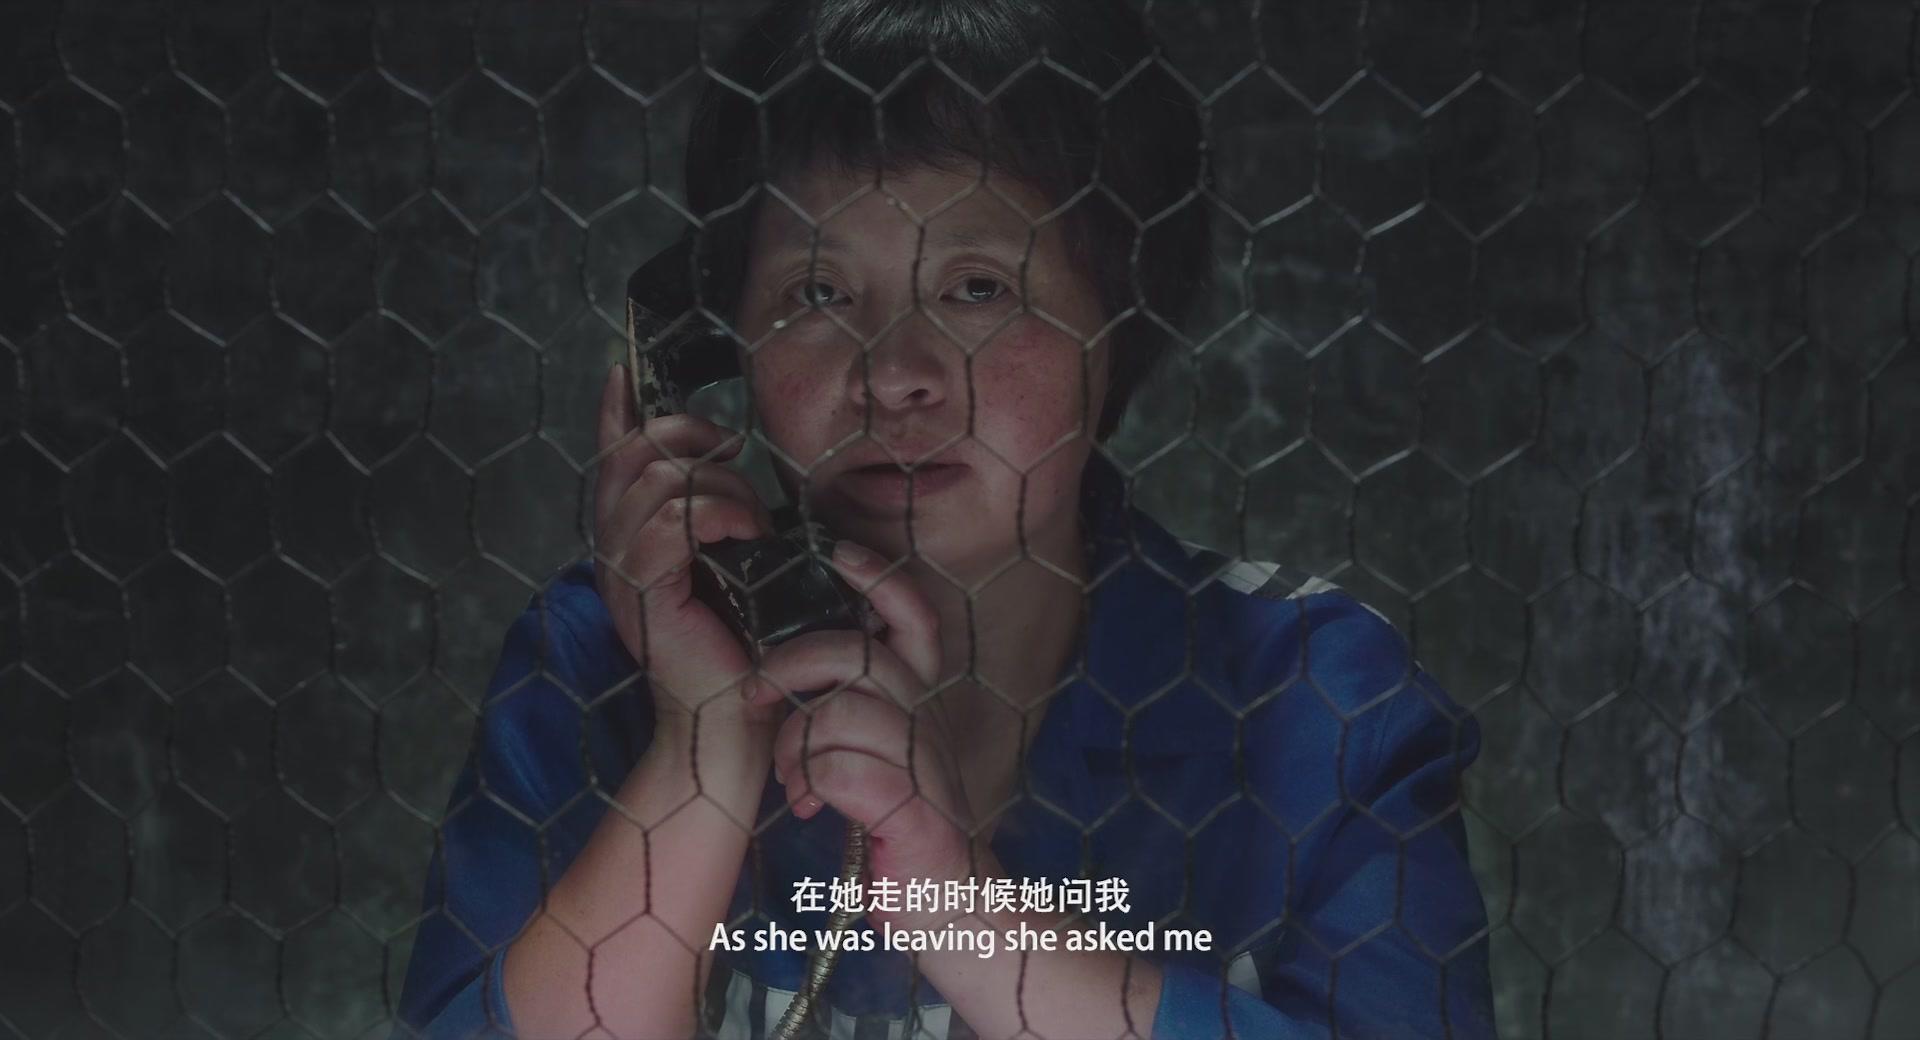 Долгий день уходит в ночь / Di qiu zui hou de ye wan (2018/WEBRip) 1080p, HDRezka Studio